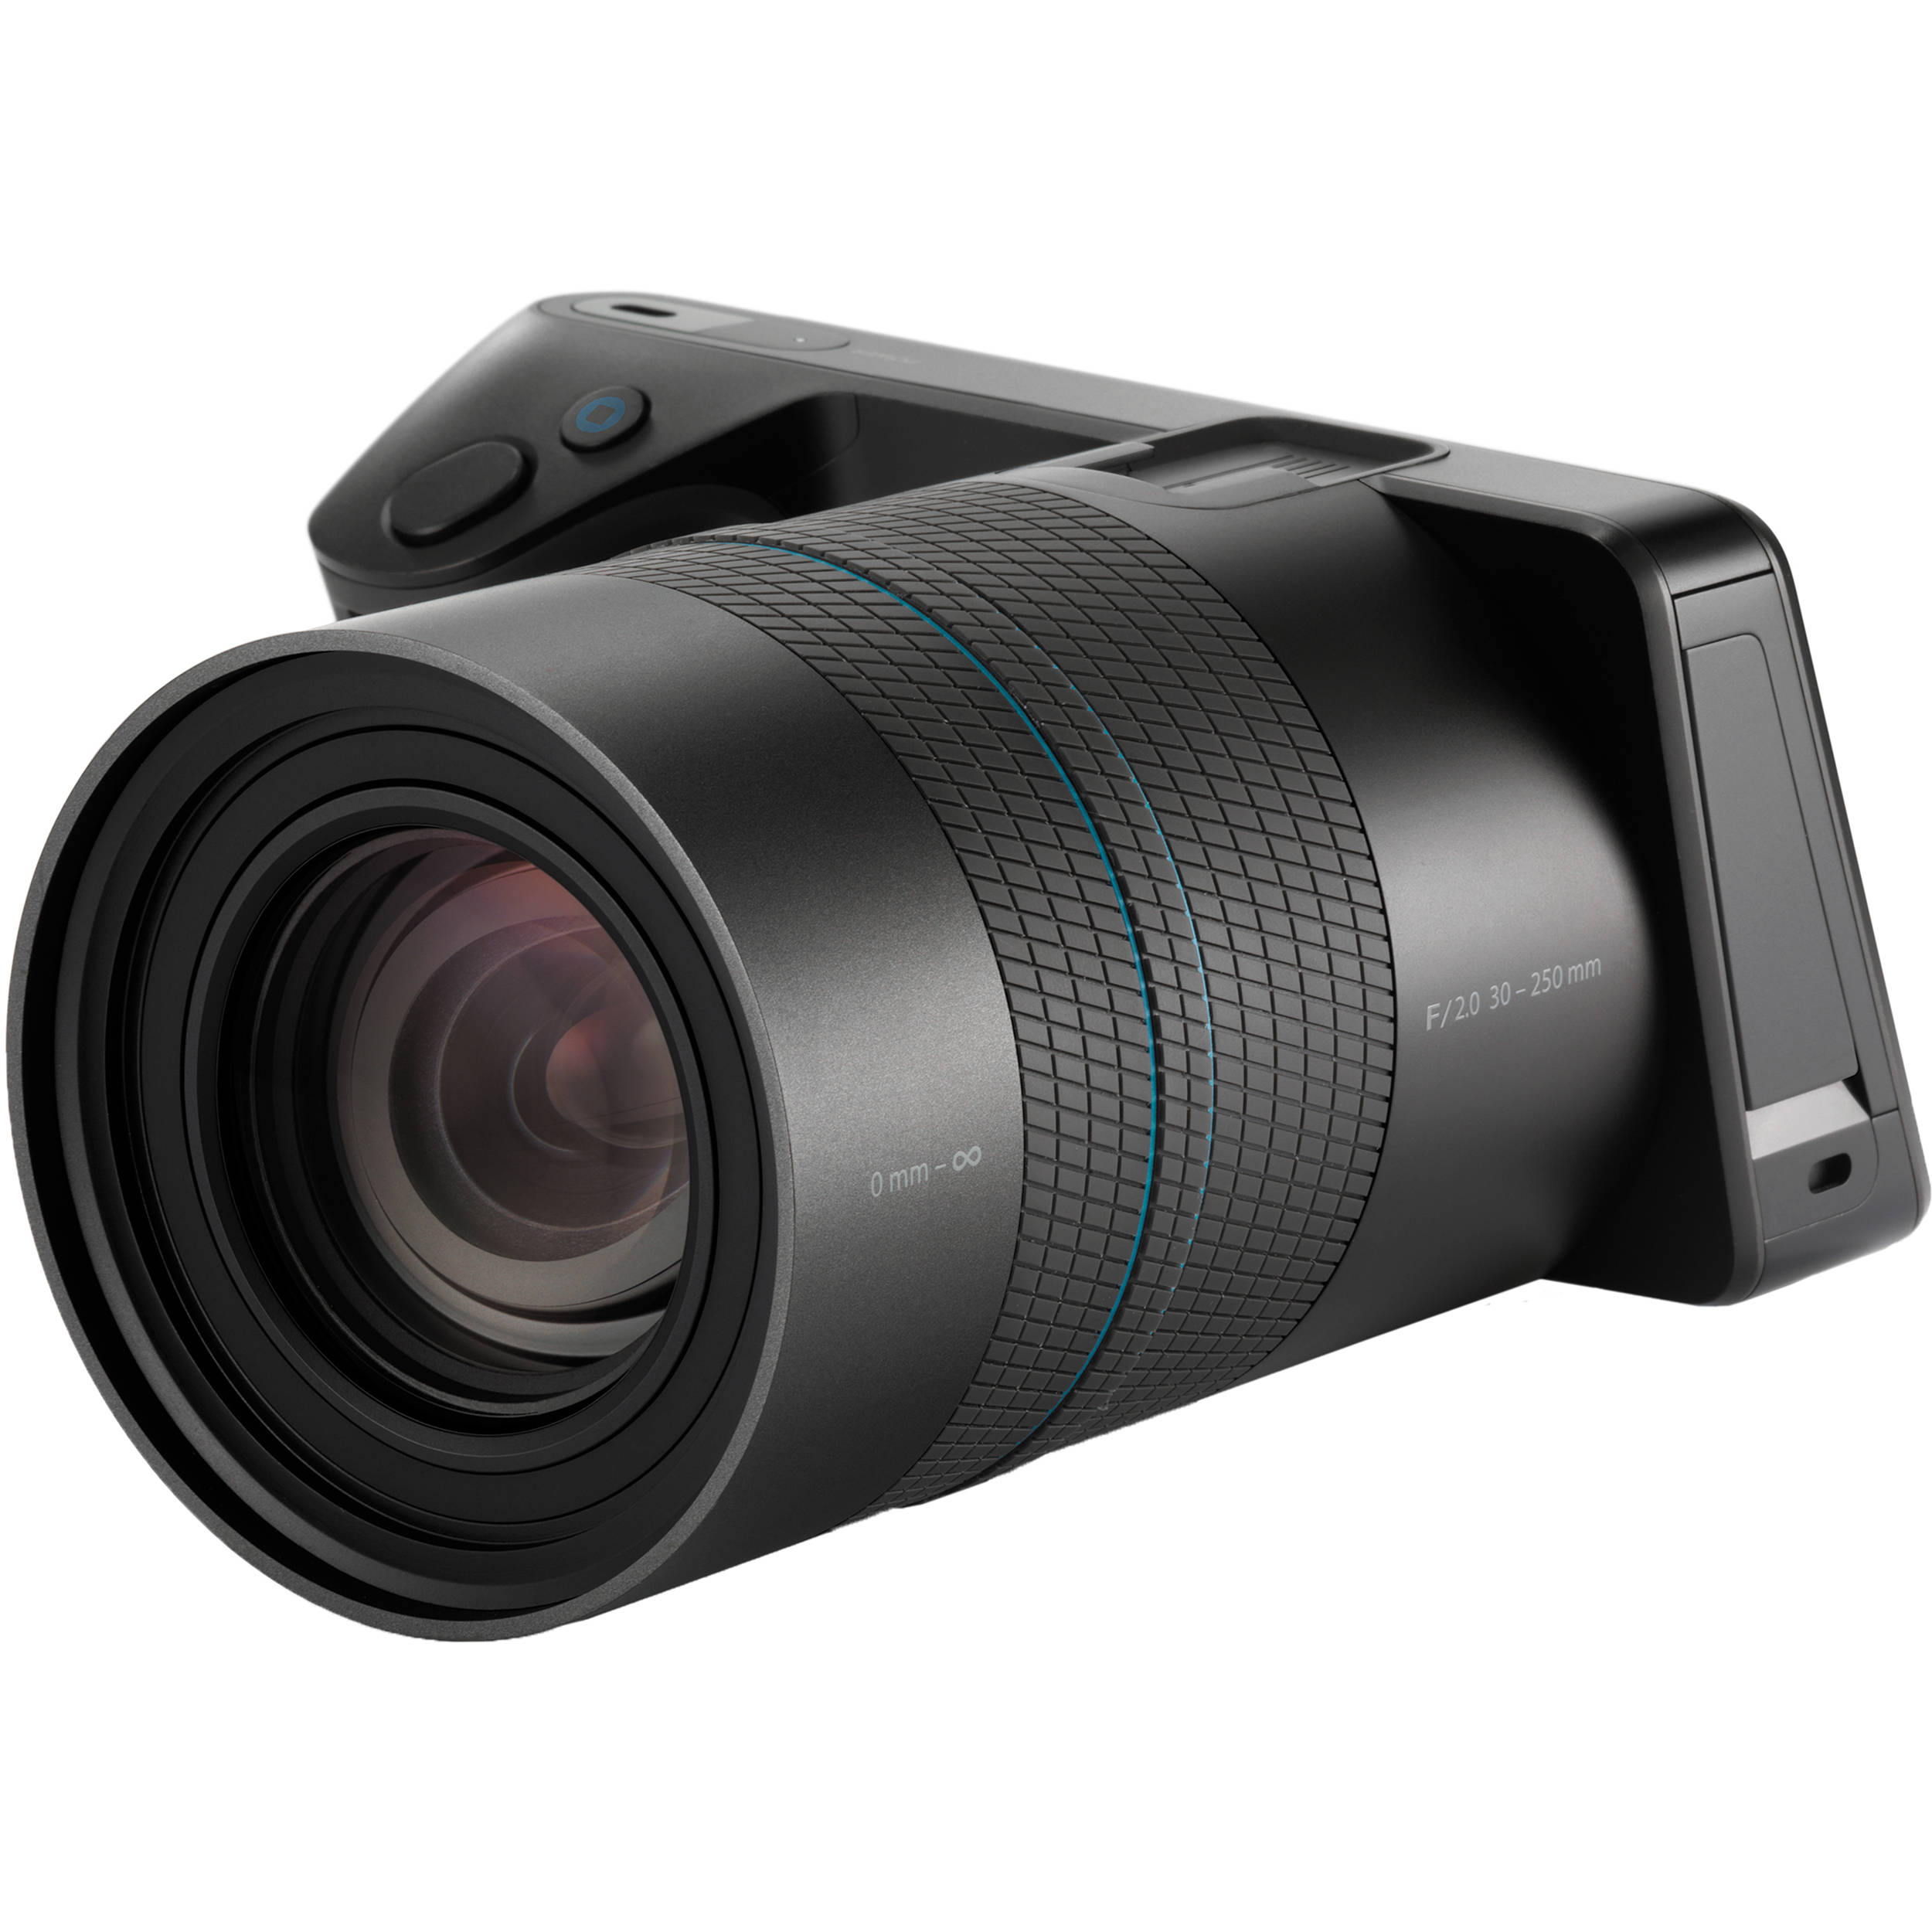 Lytro Illum Light Field Digital Camera B5-0035 B&H Photo Video